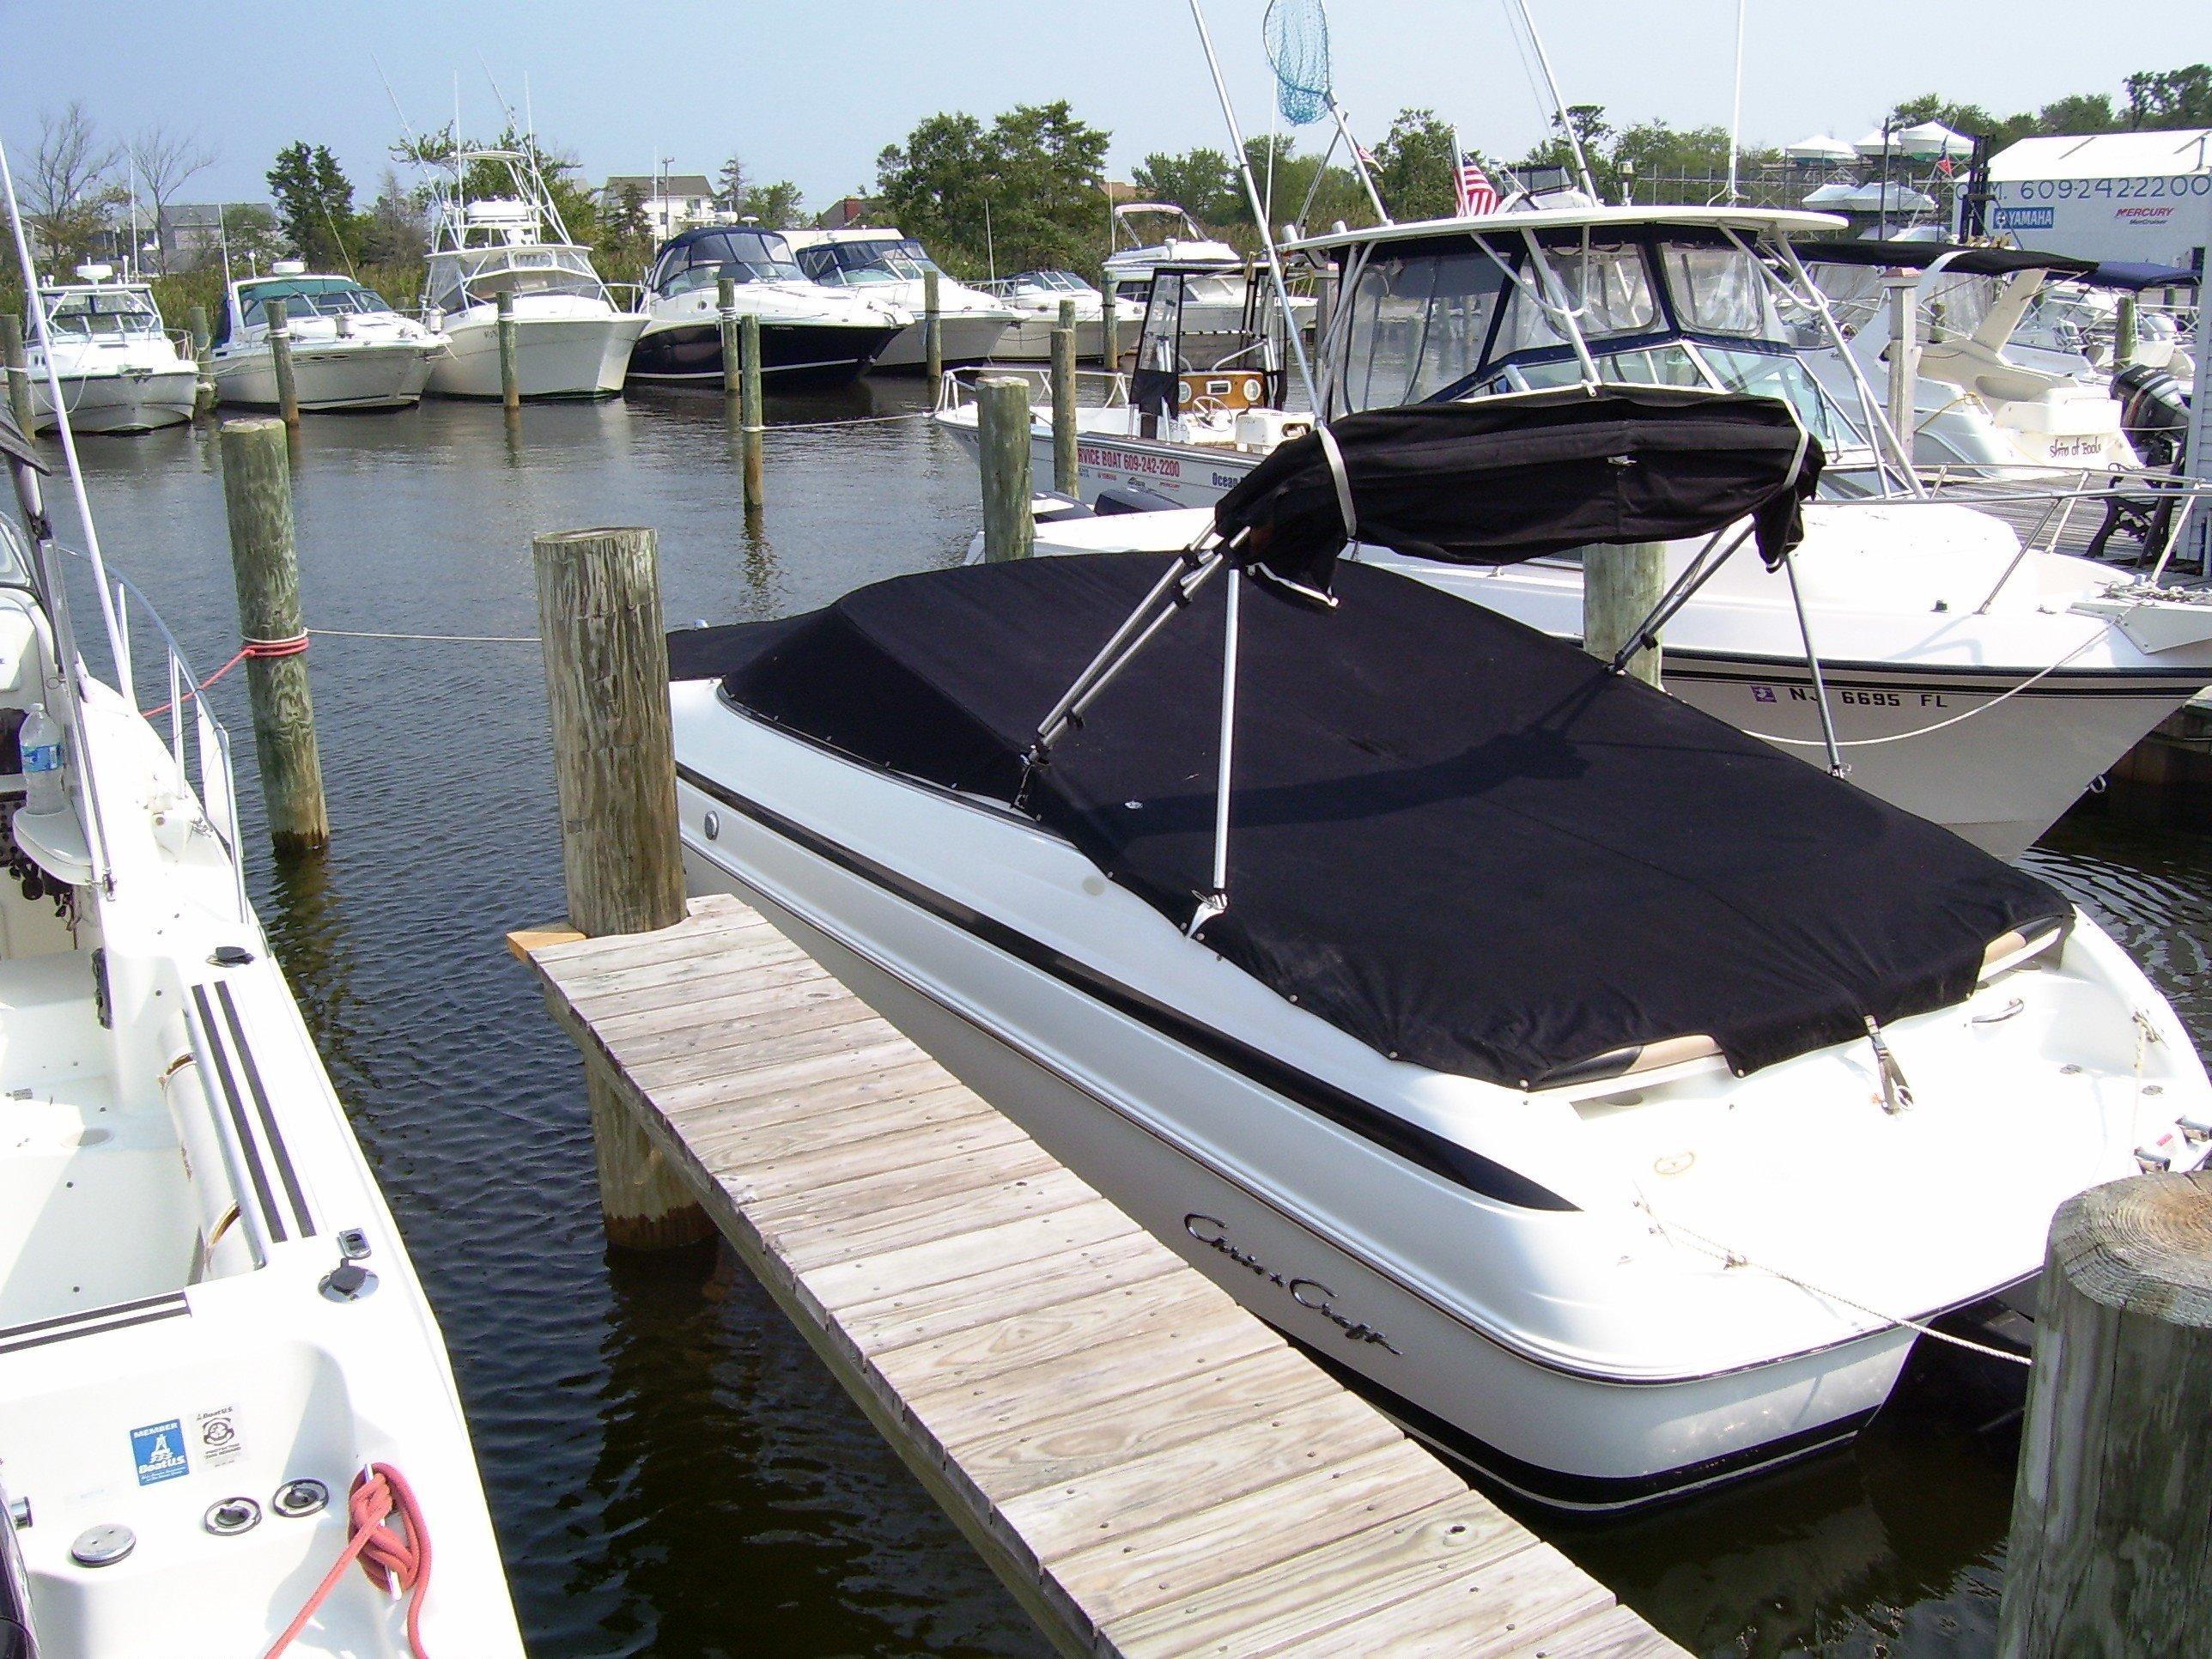 1999 chris craft 210 bowrider power boat for sale www yachtworld com2000 Chris Craft 210 Wiring Diagram #18